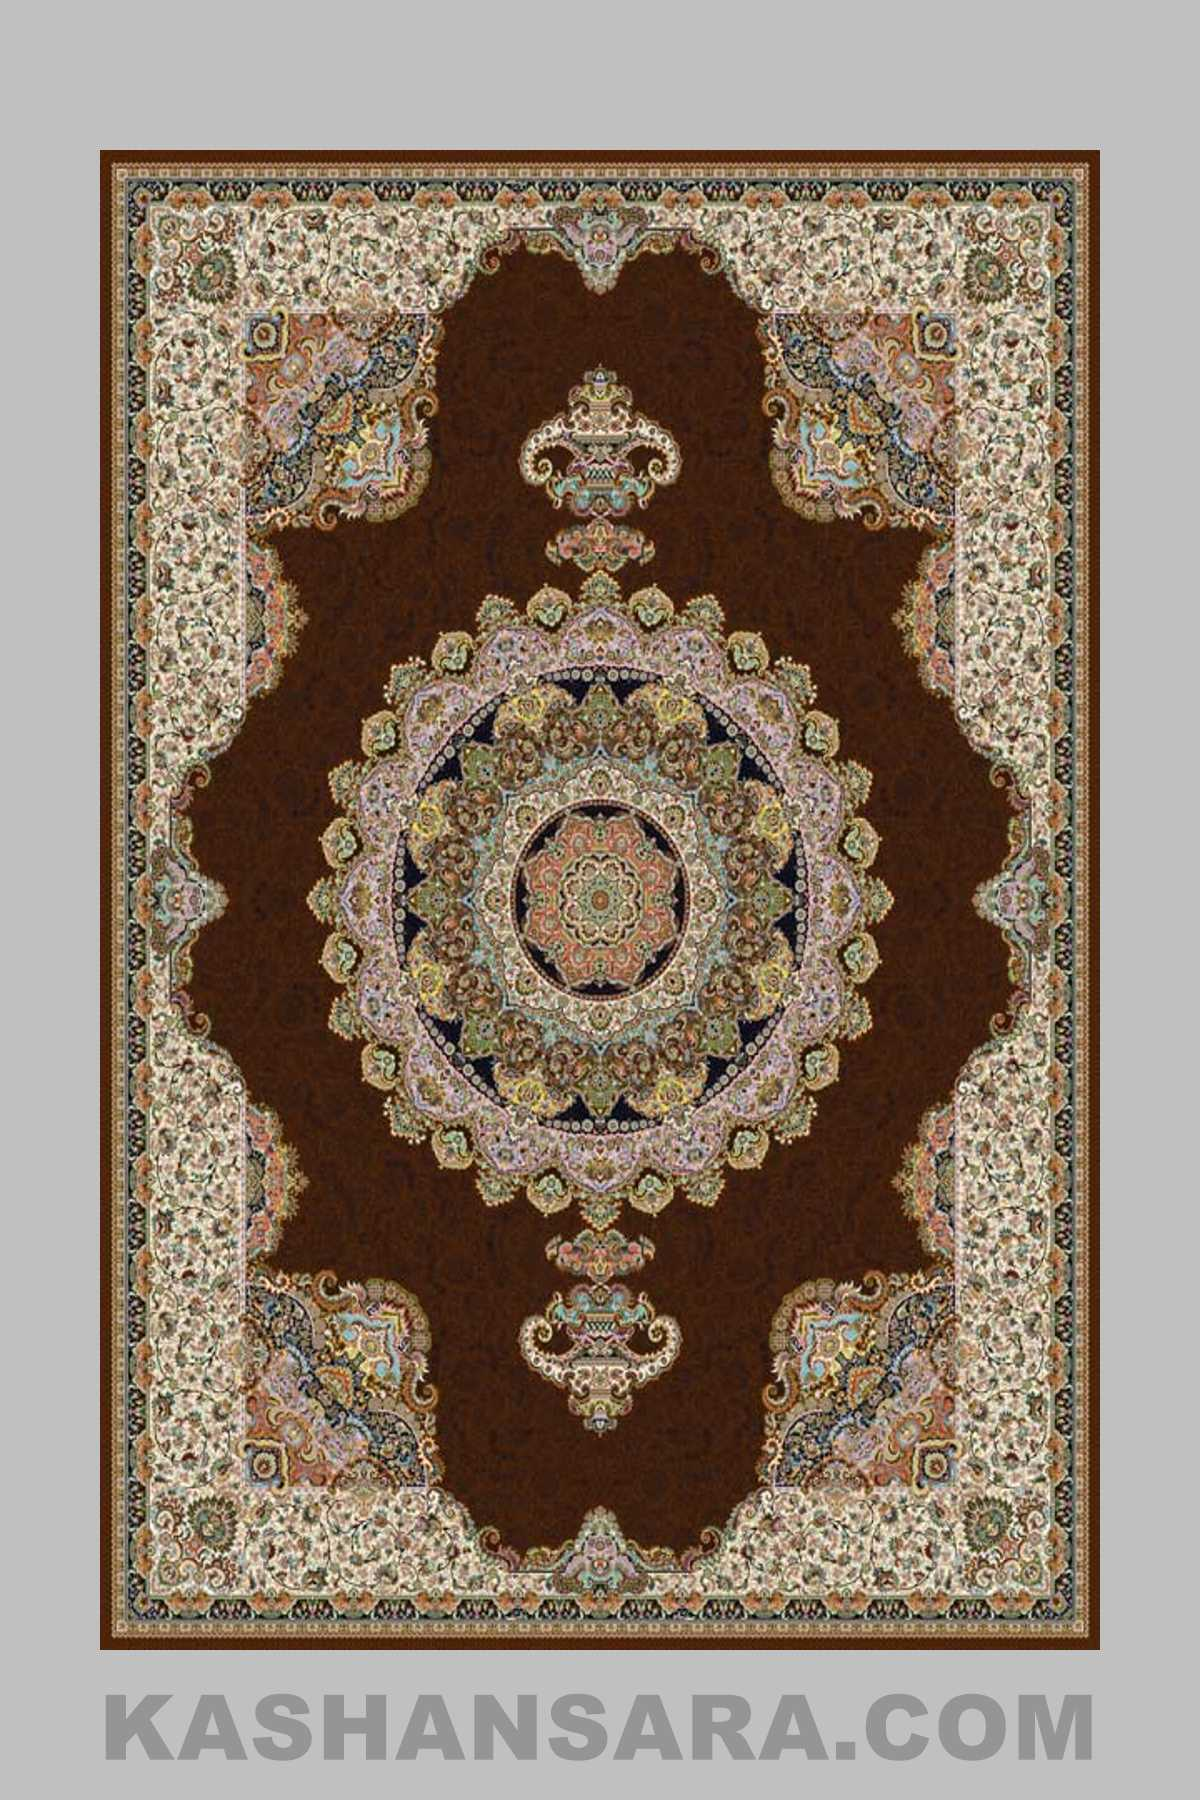 Yalda-1200-قندیل عرش دارچینی – Ghandile arsh.D-12001800